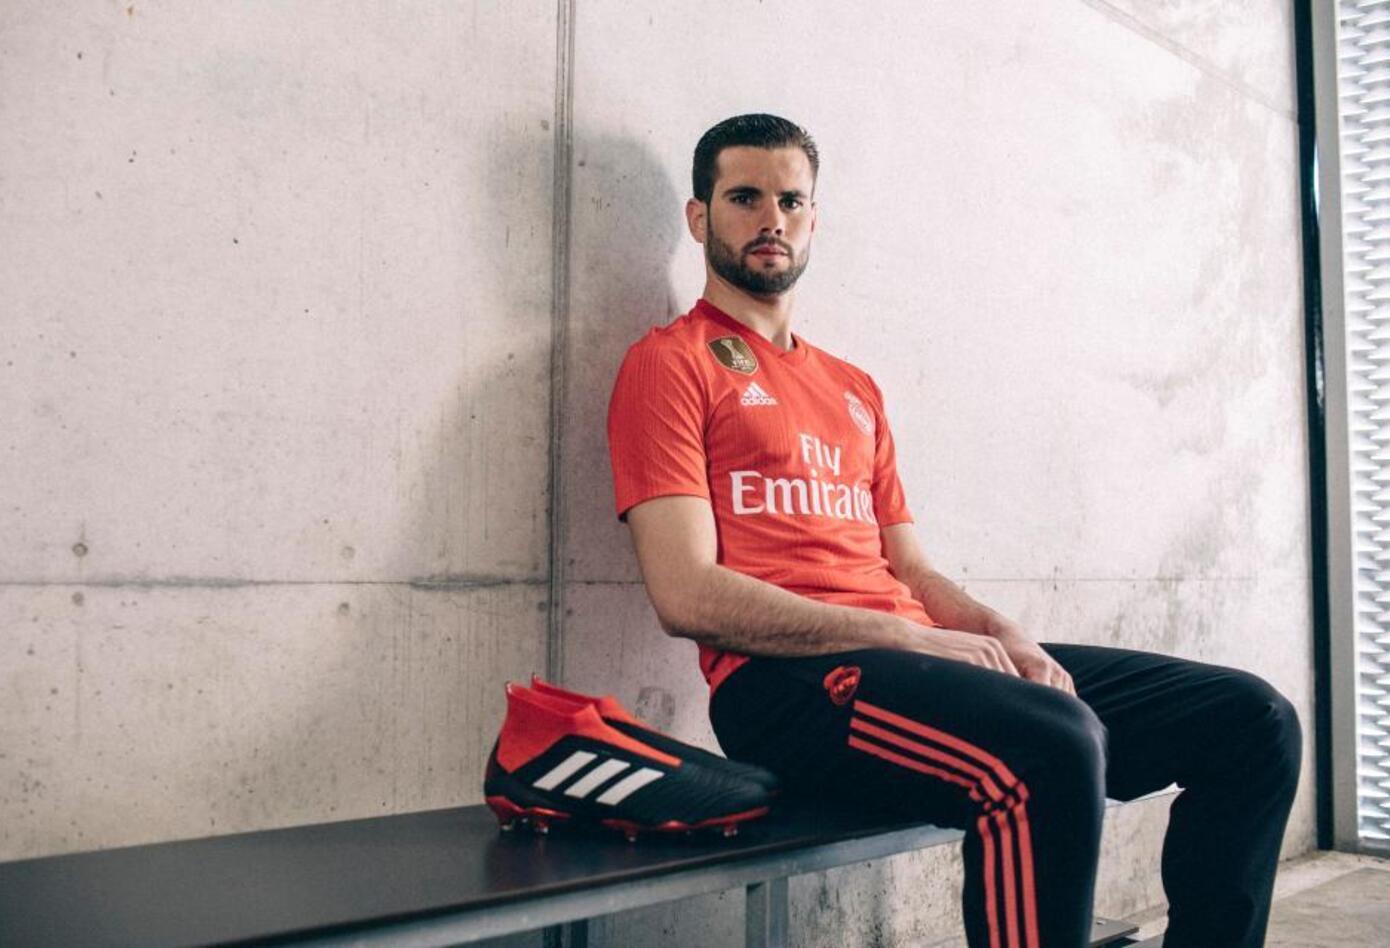 Nacho con la camiseta roja del Real Madrid 2018-2019